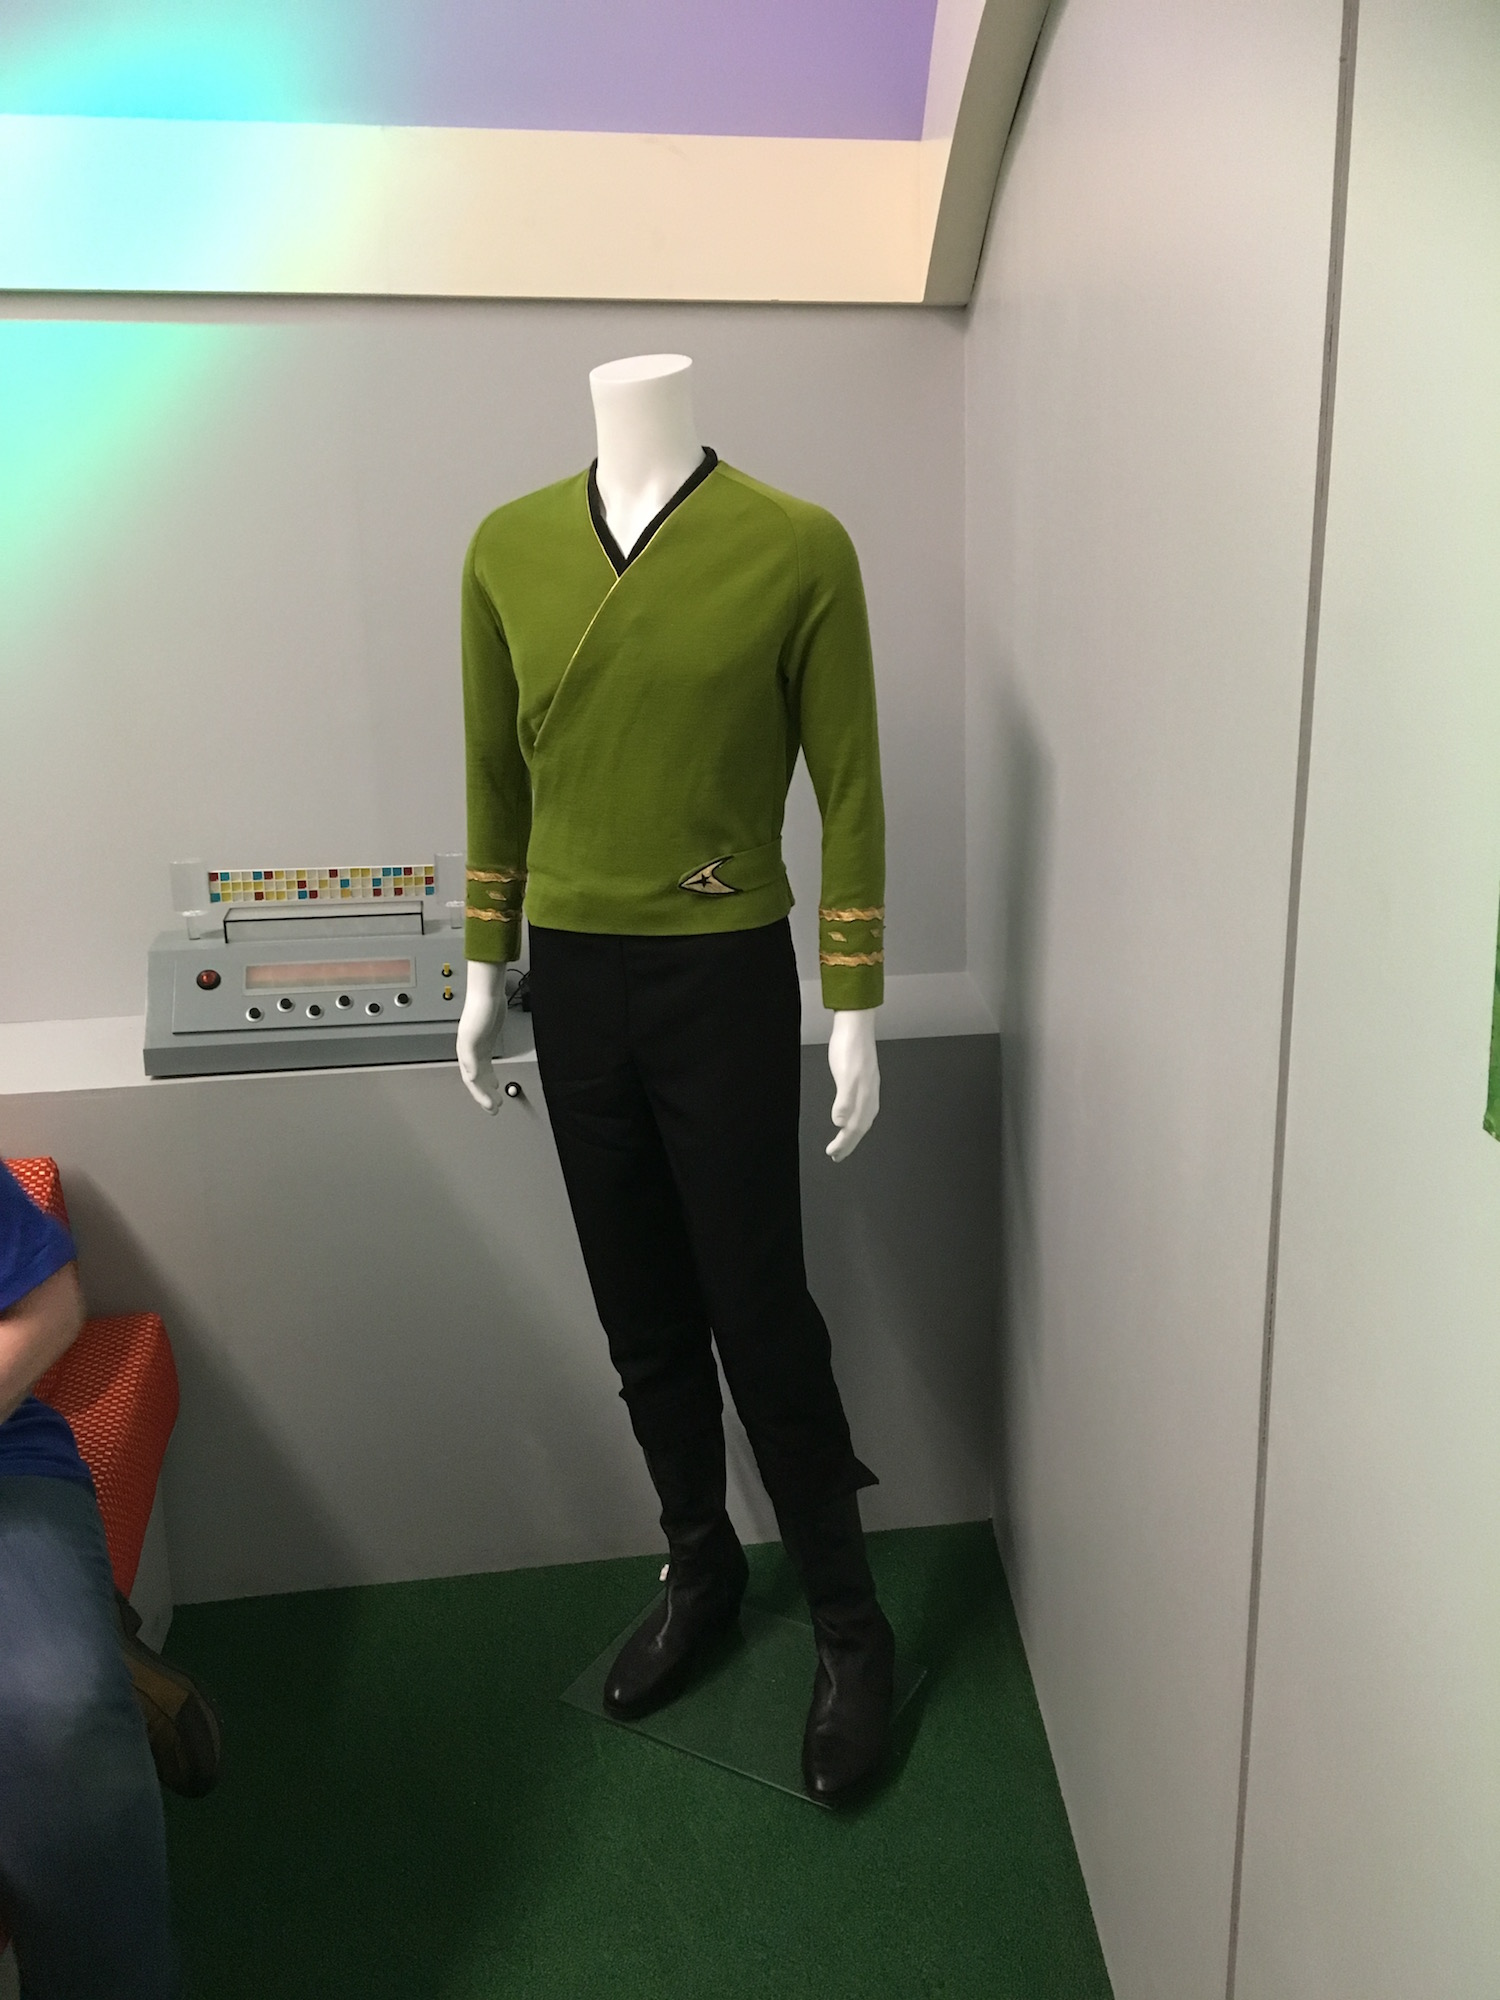 Captain Kirk's Green Wraparound Uniform Tunic ©2017 David R. George III